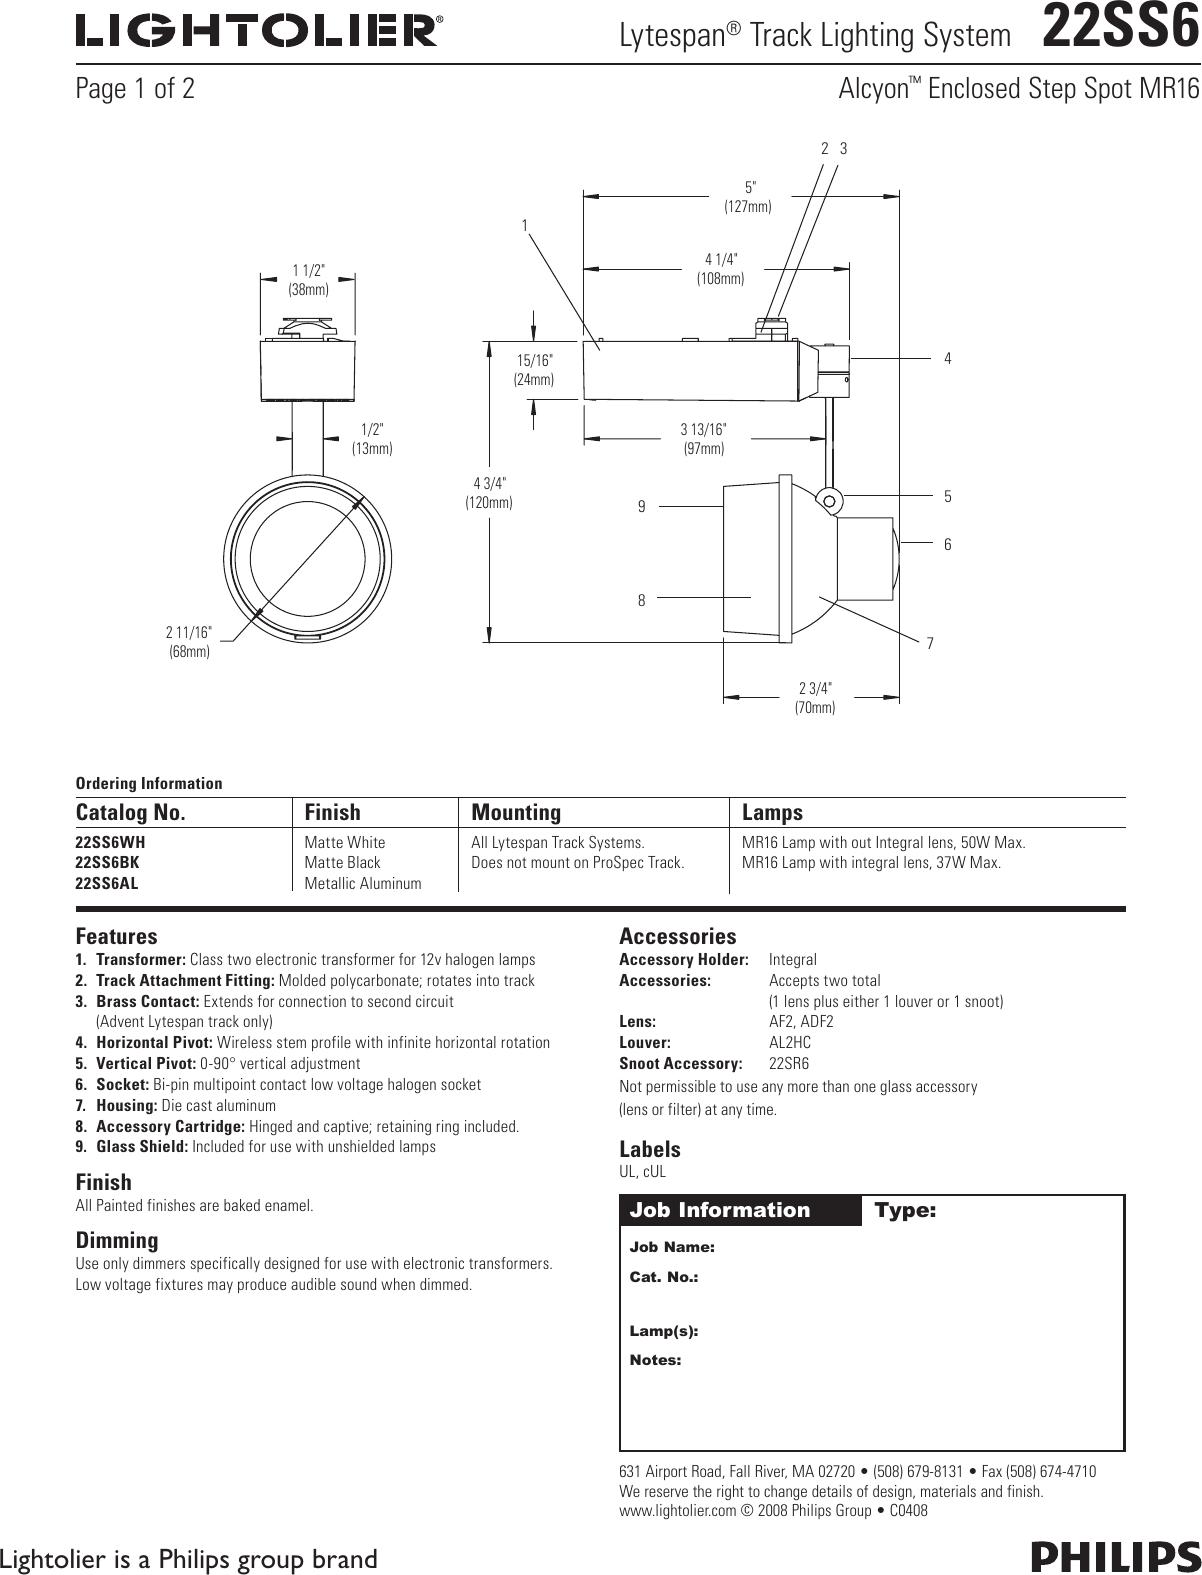 lightolier lytespan track lighting system 22ss6 users manual